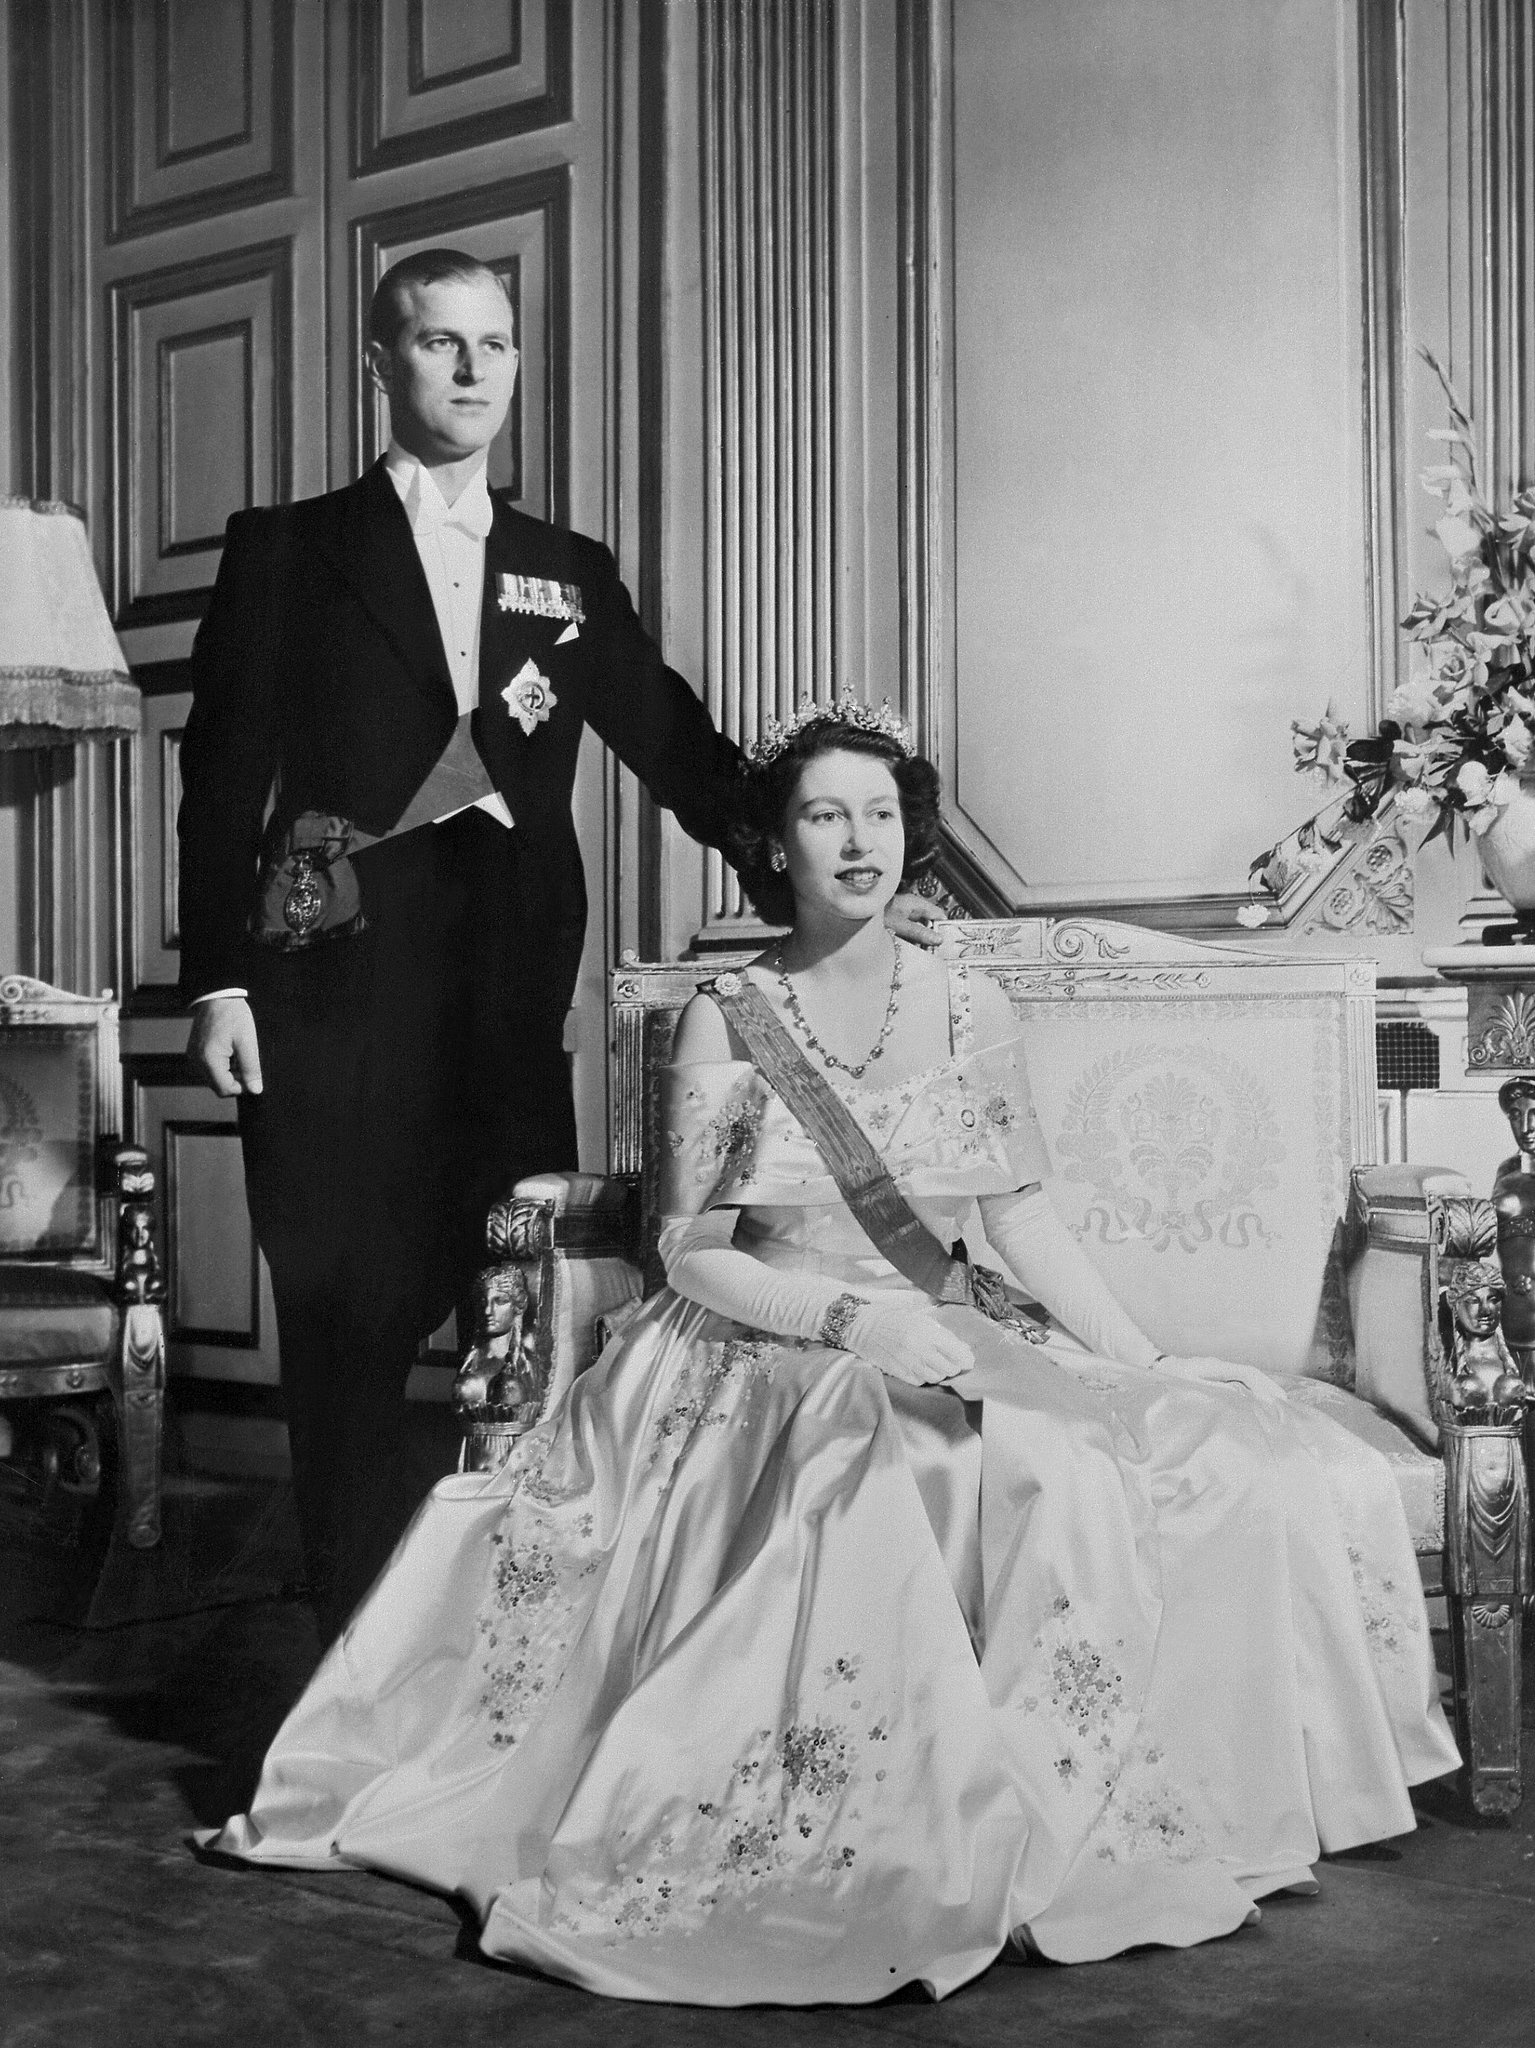 Queen Elizabeth Ii And Prince Philip 2013 Queen Elizabeth and Pr...